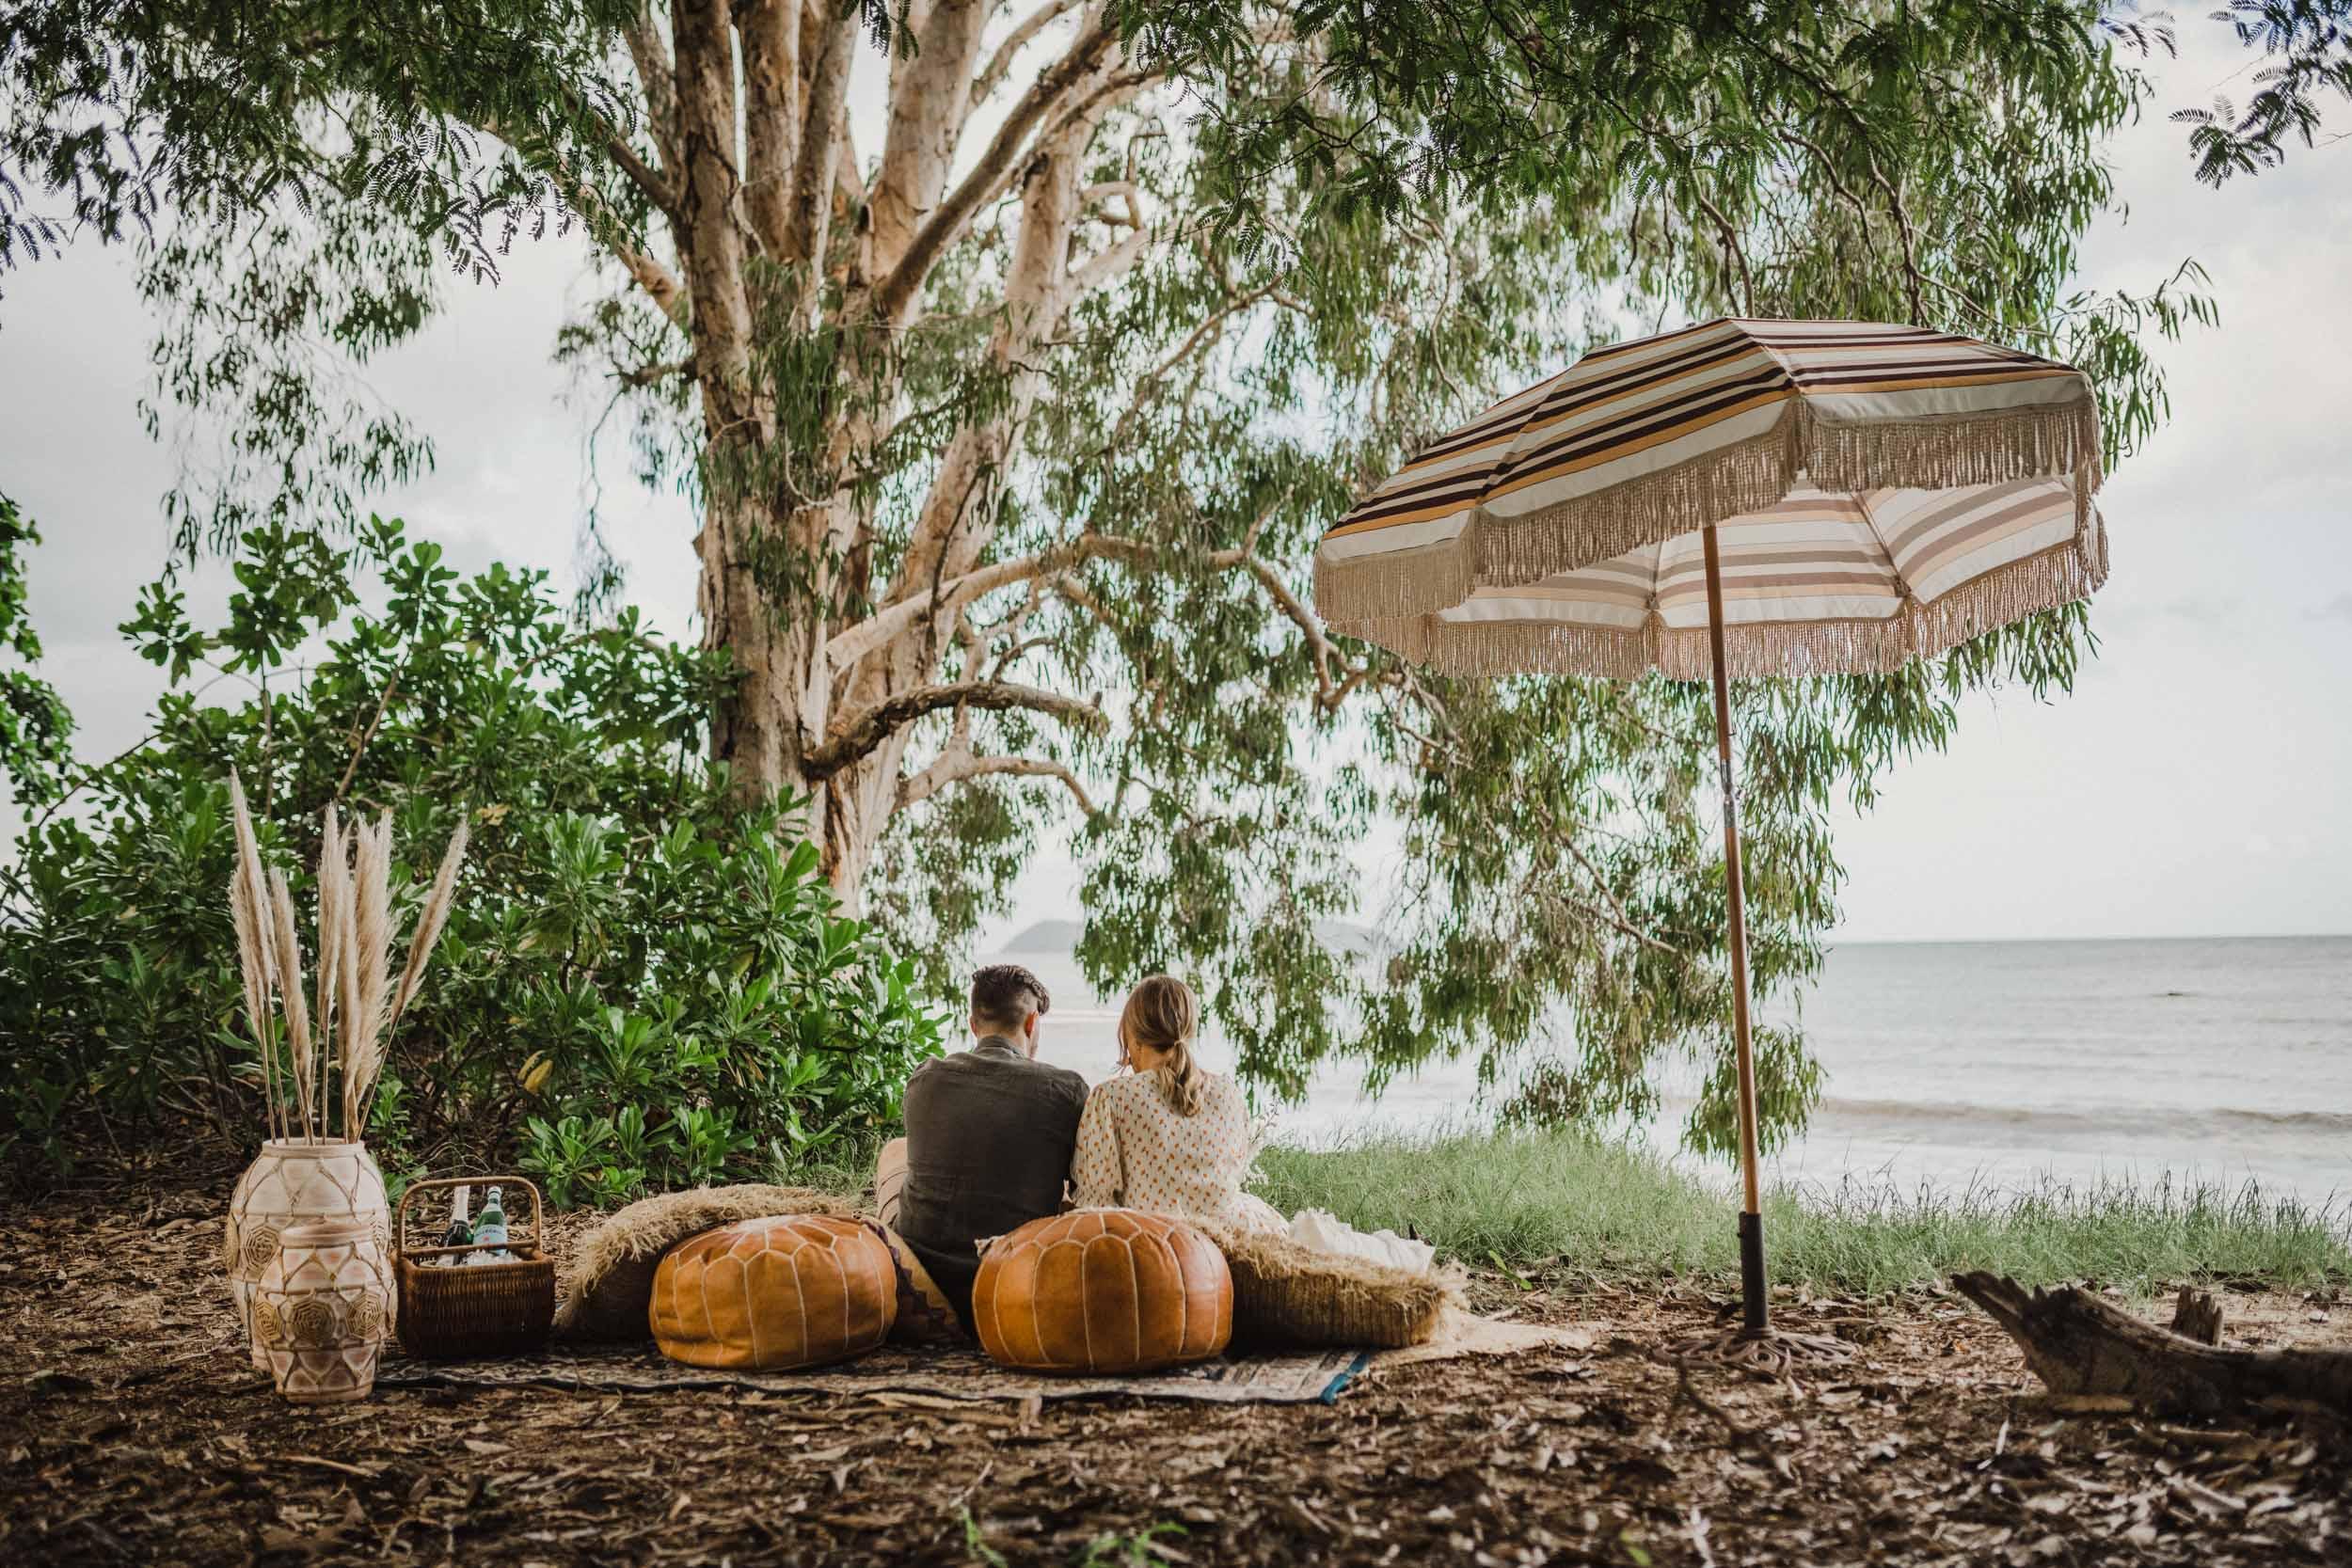 The Raw Photographer - Cairns Wedding Photographer - Beach Engagement Shoot - Candid Picnic-3.jpg